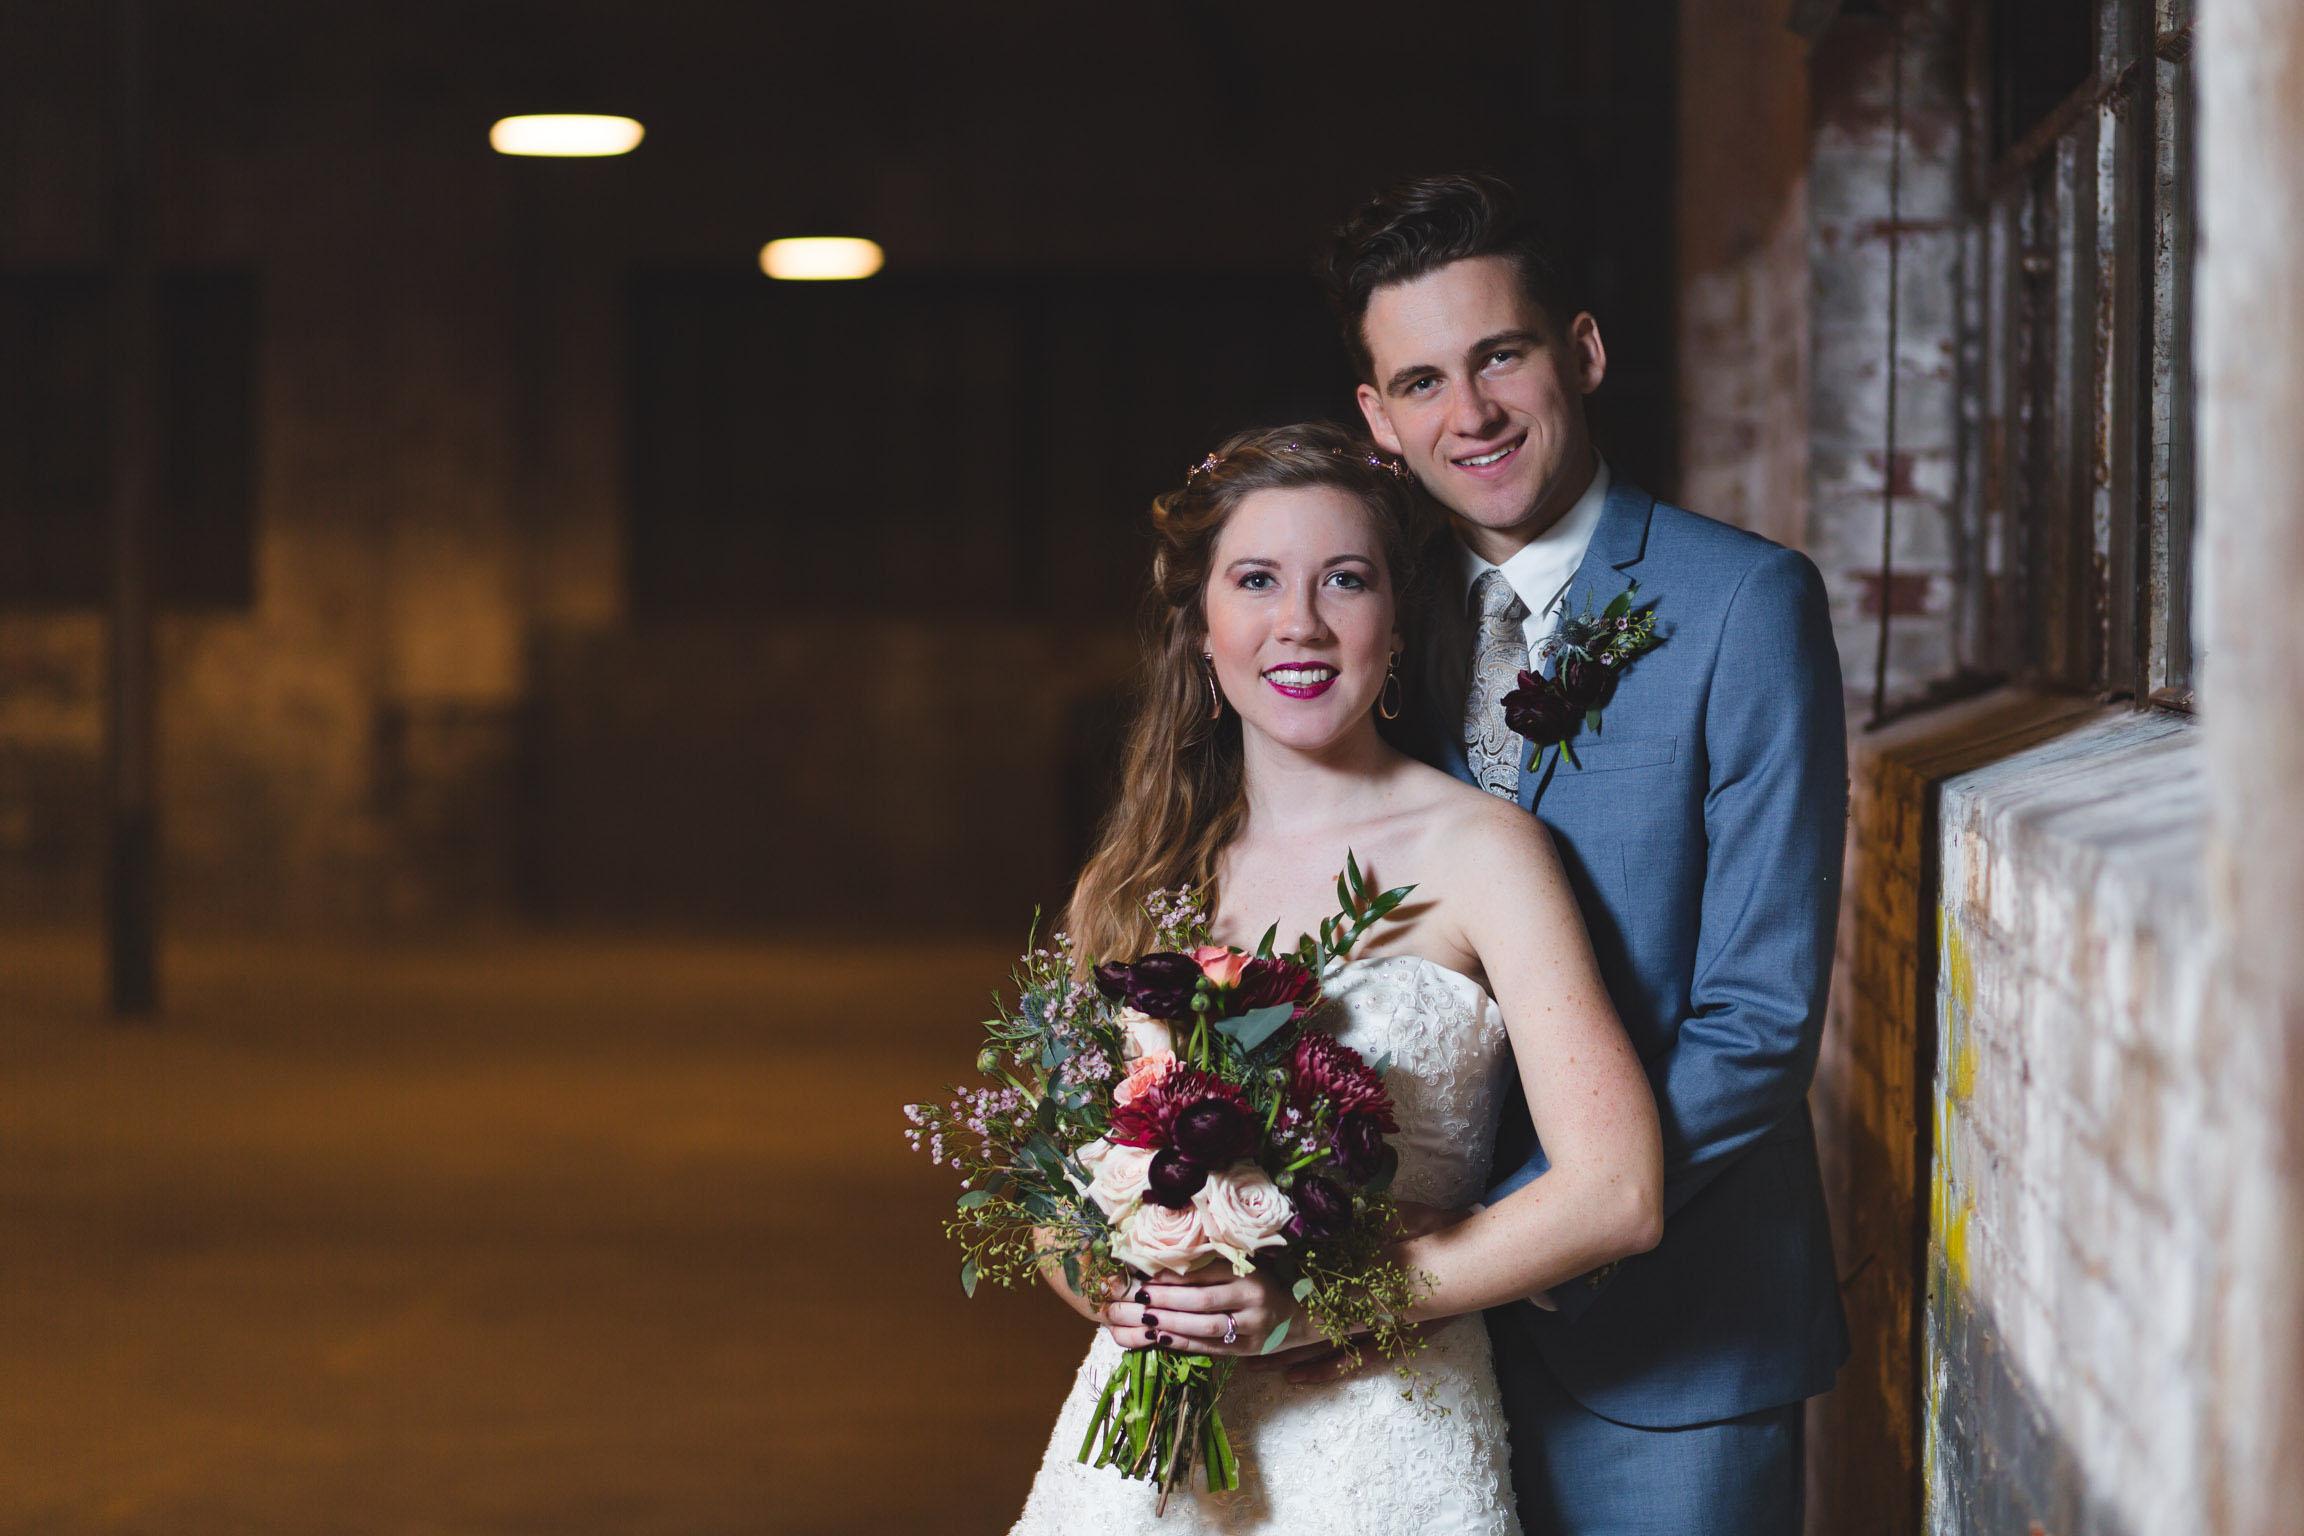 Adam-Szrmack-The-Glass-Factory-Wedding-123.jpg